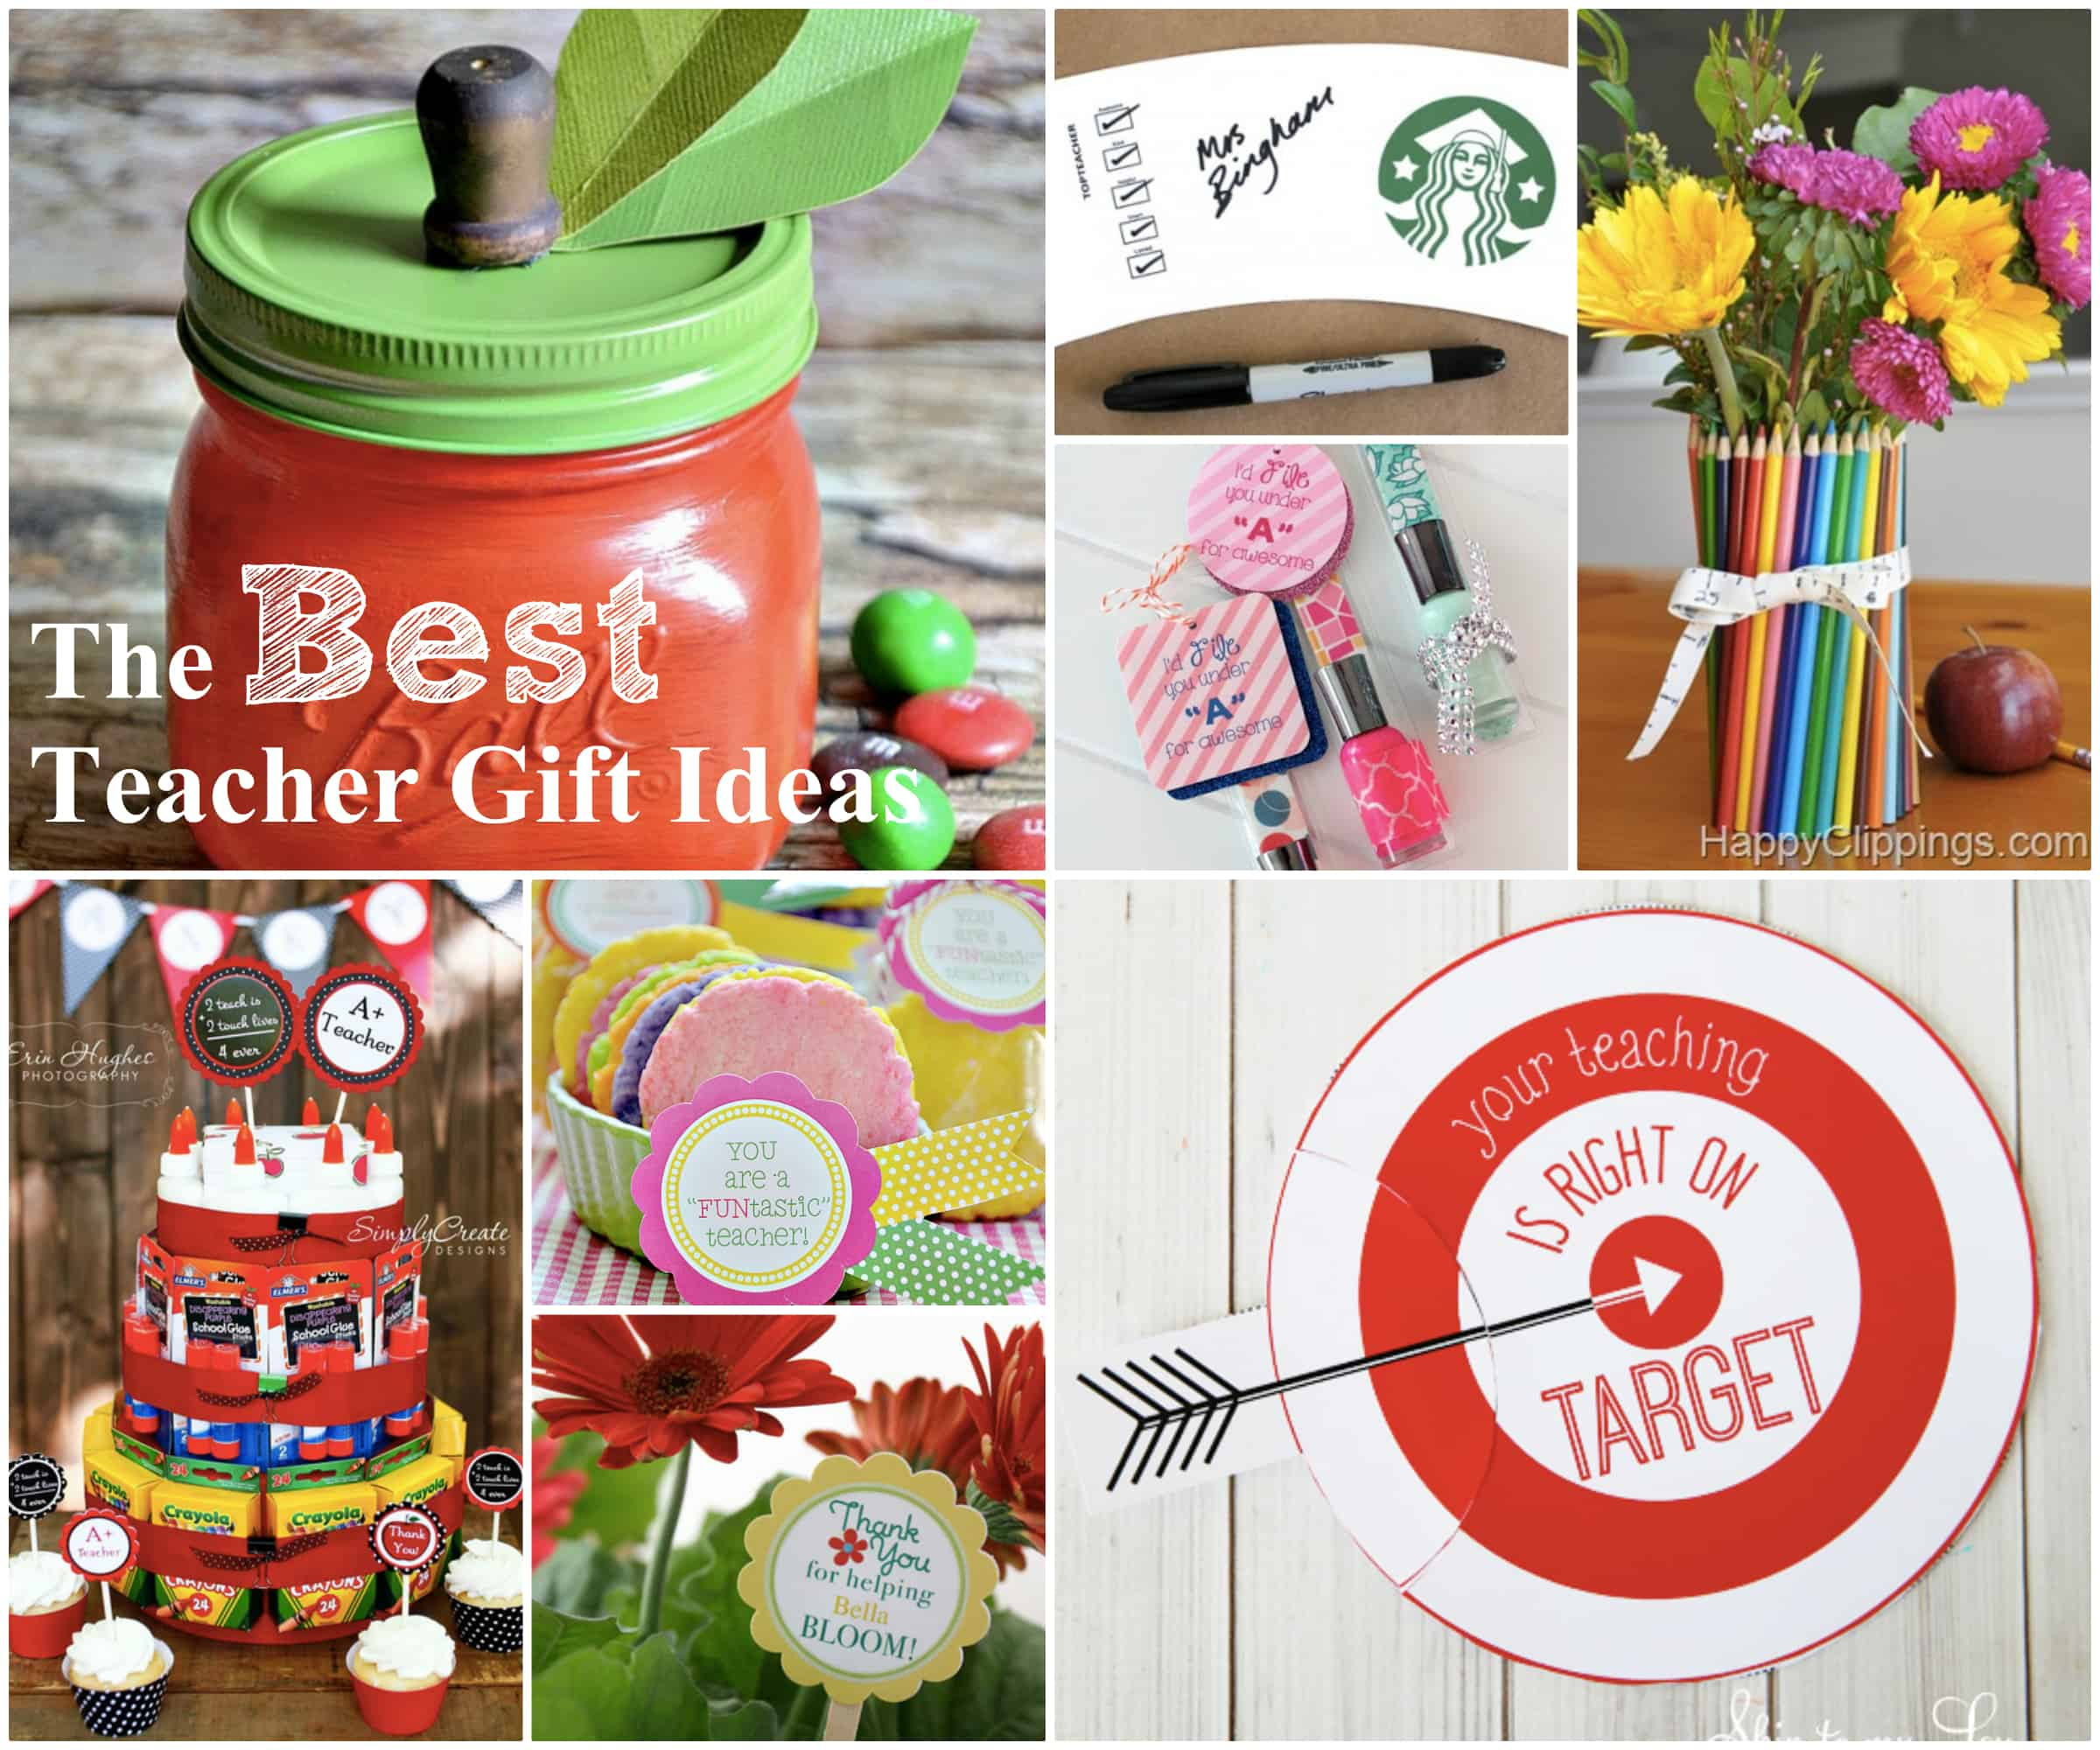 15 Of The Best Teacher Gift Ideas